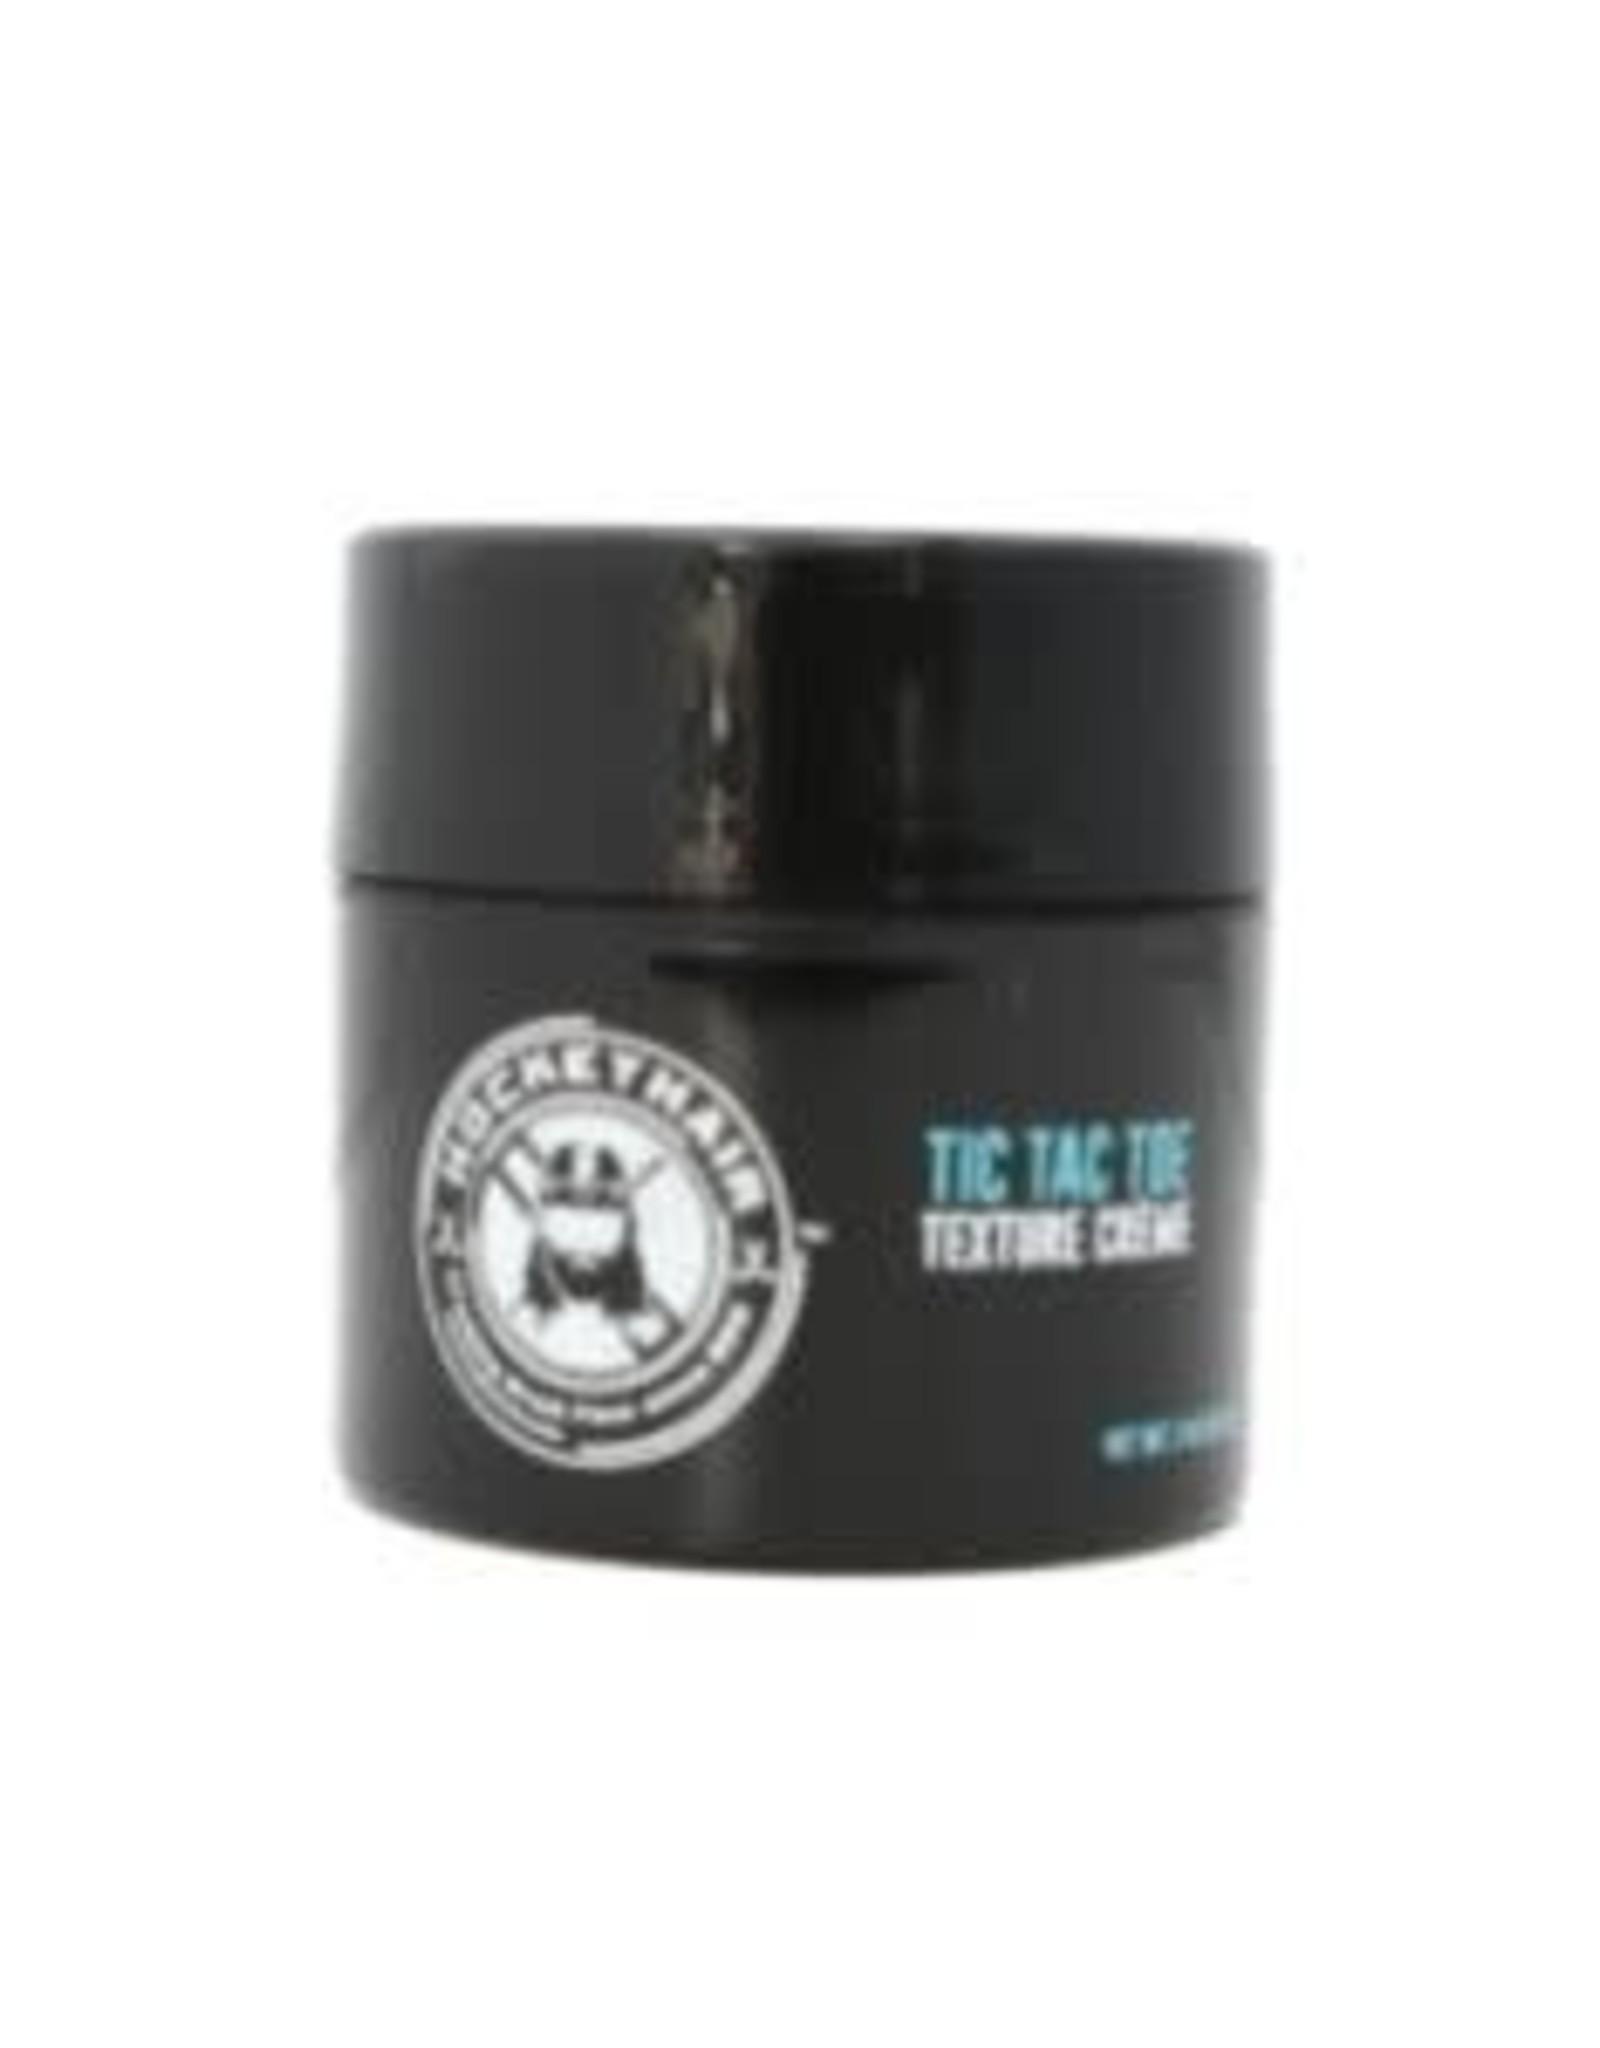 Hockey Hair Hockey Hair Tic Tac Toe Texture Cream